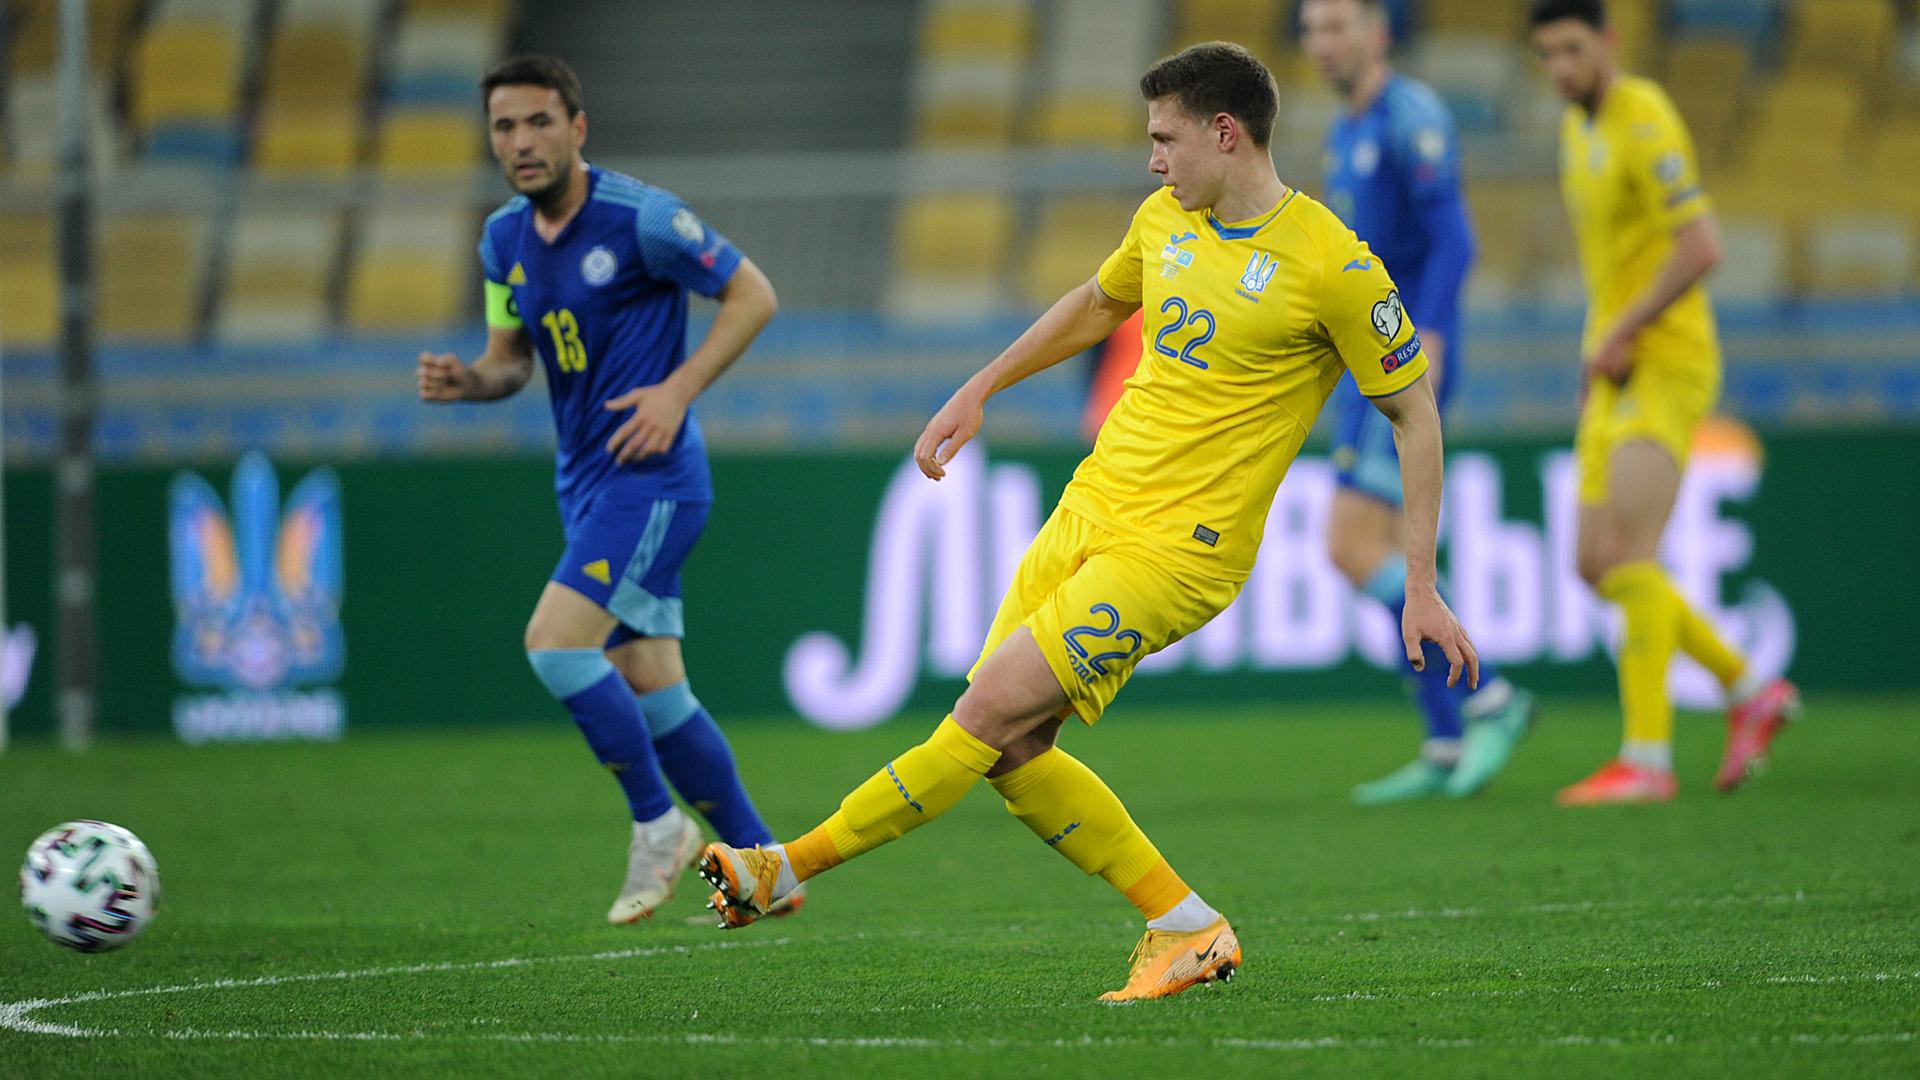 Стабільність - не завжди добре: реакция сети на матч Украина - Казахстан